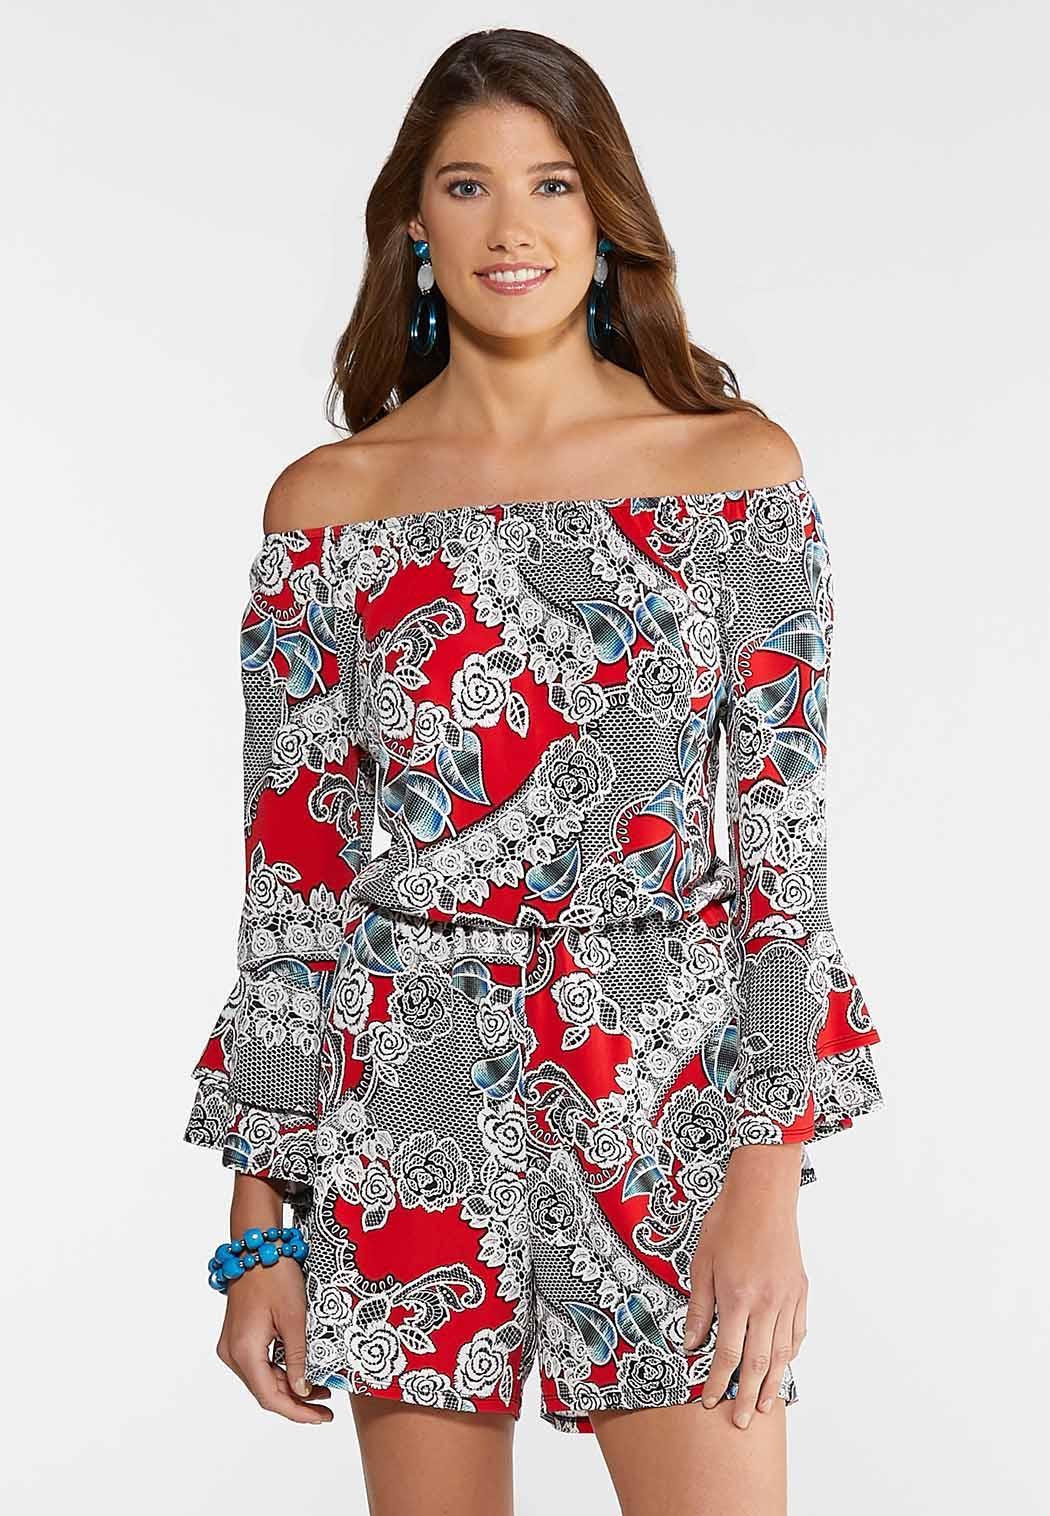 e422d489f98e2 Women's Dresses- Fit and Flare, Swing, Maxi, Midi & More Affordable Dresses